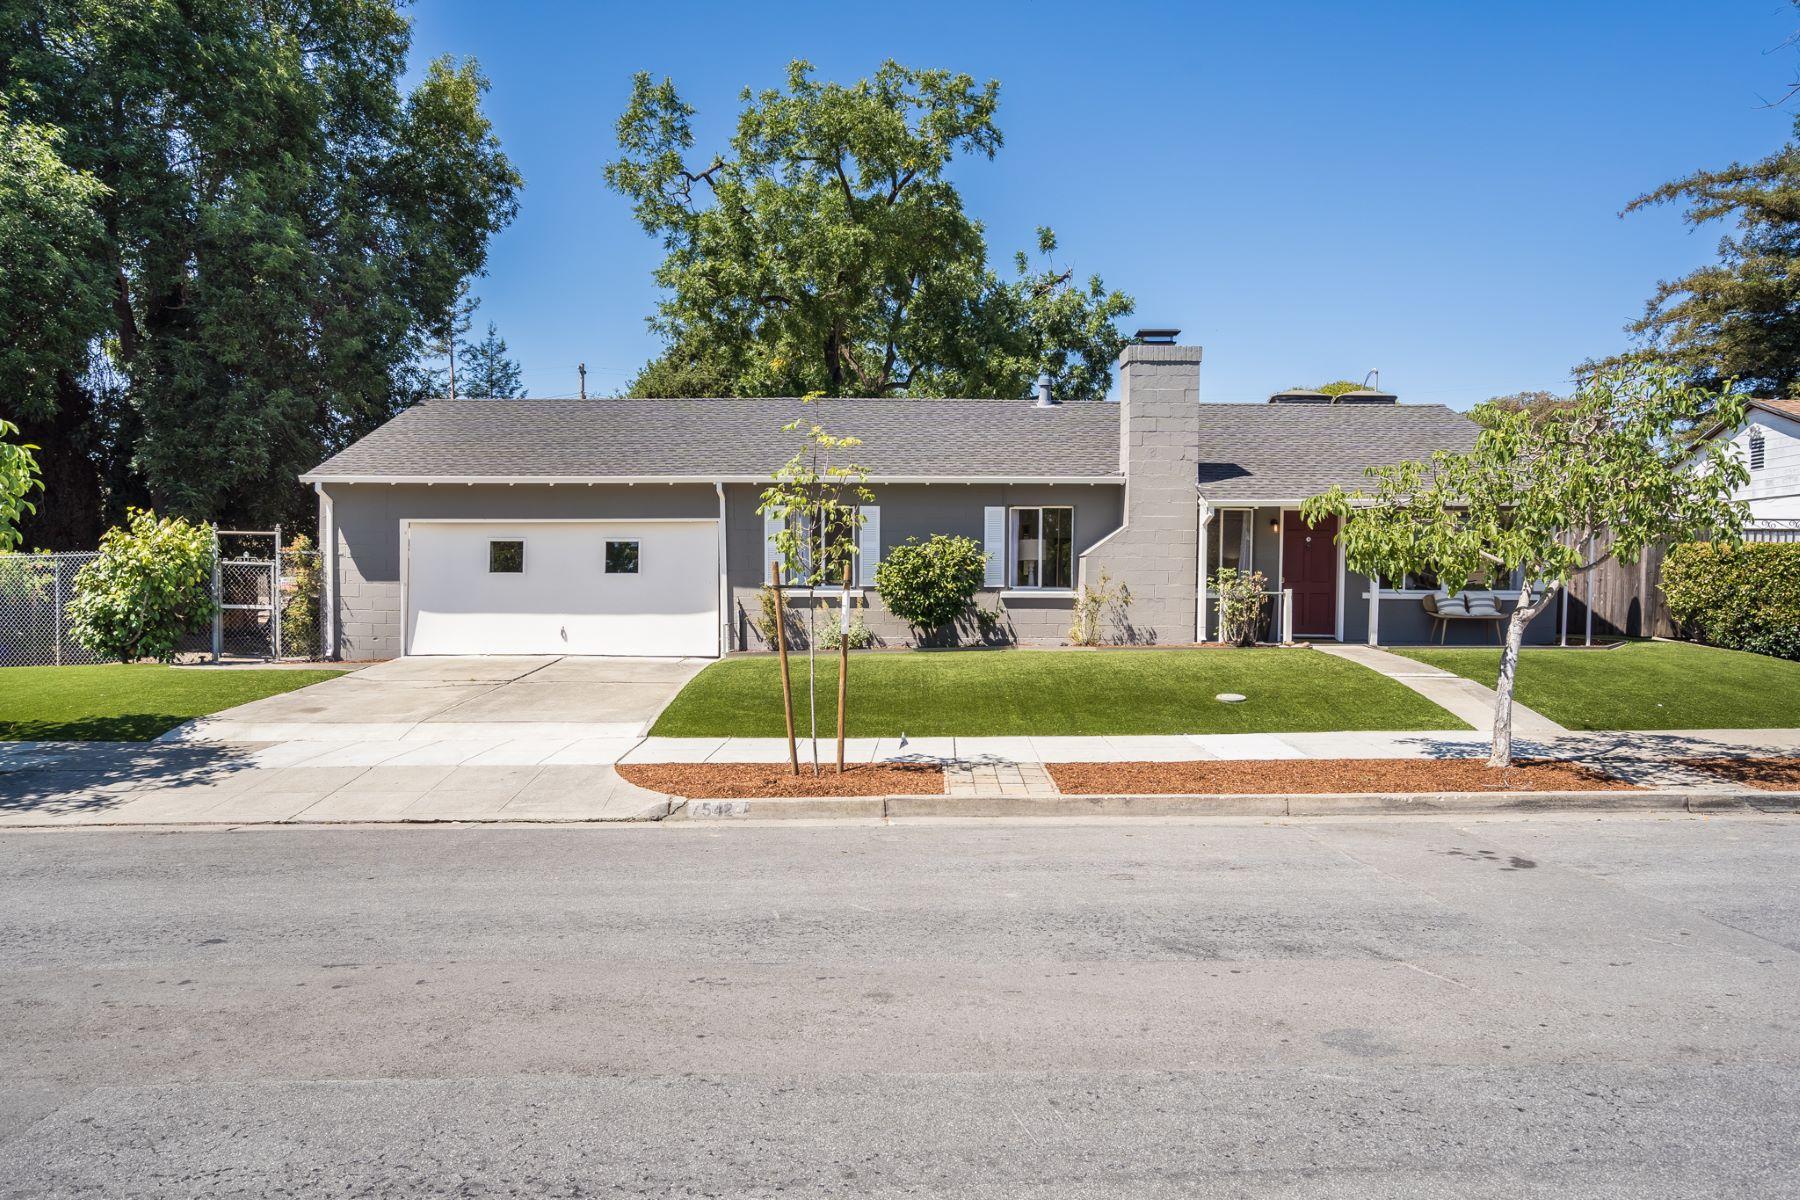 Single Family Homes 为 销售 在 542 Lancaster Way 雷德伍德城, 加利福尼亚州 94062 美国